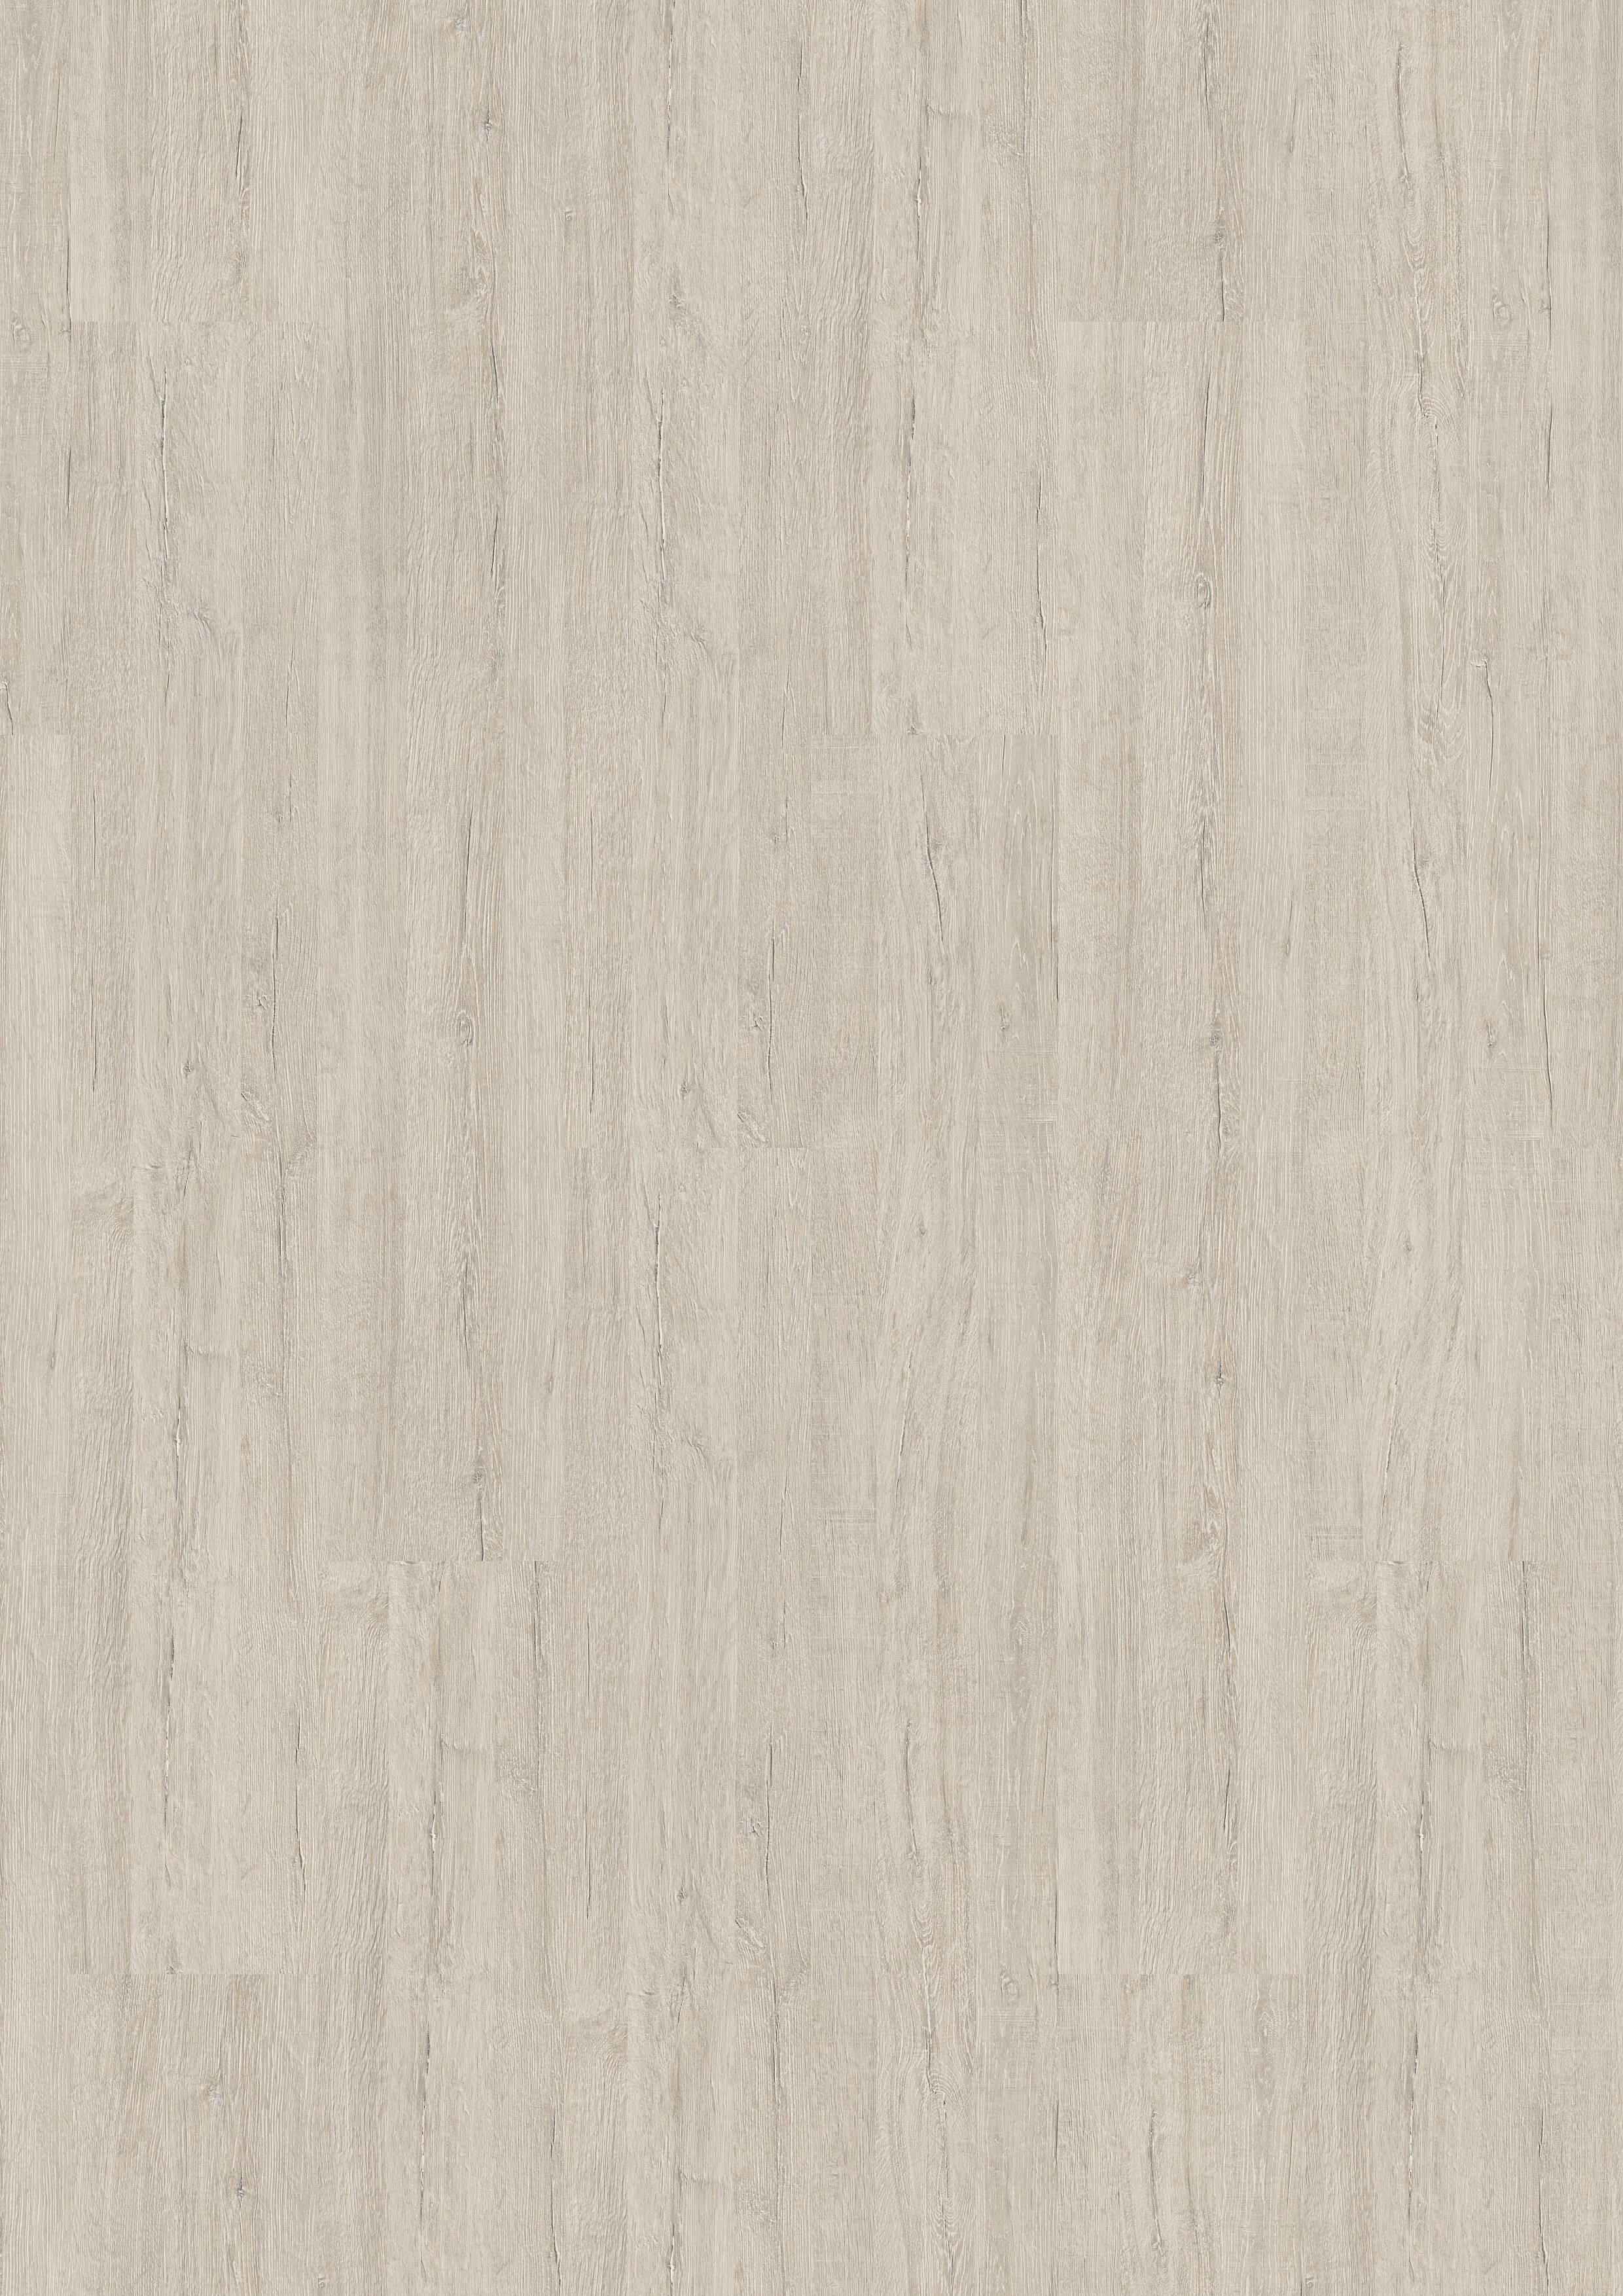 3517 - Oak Whiteline